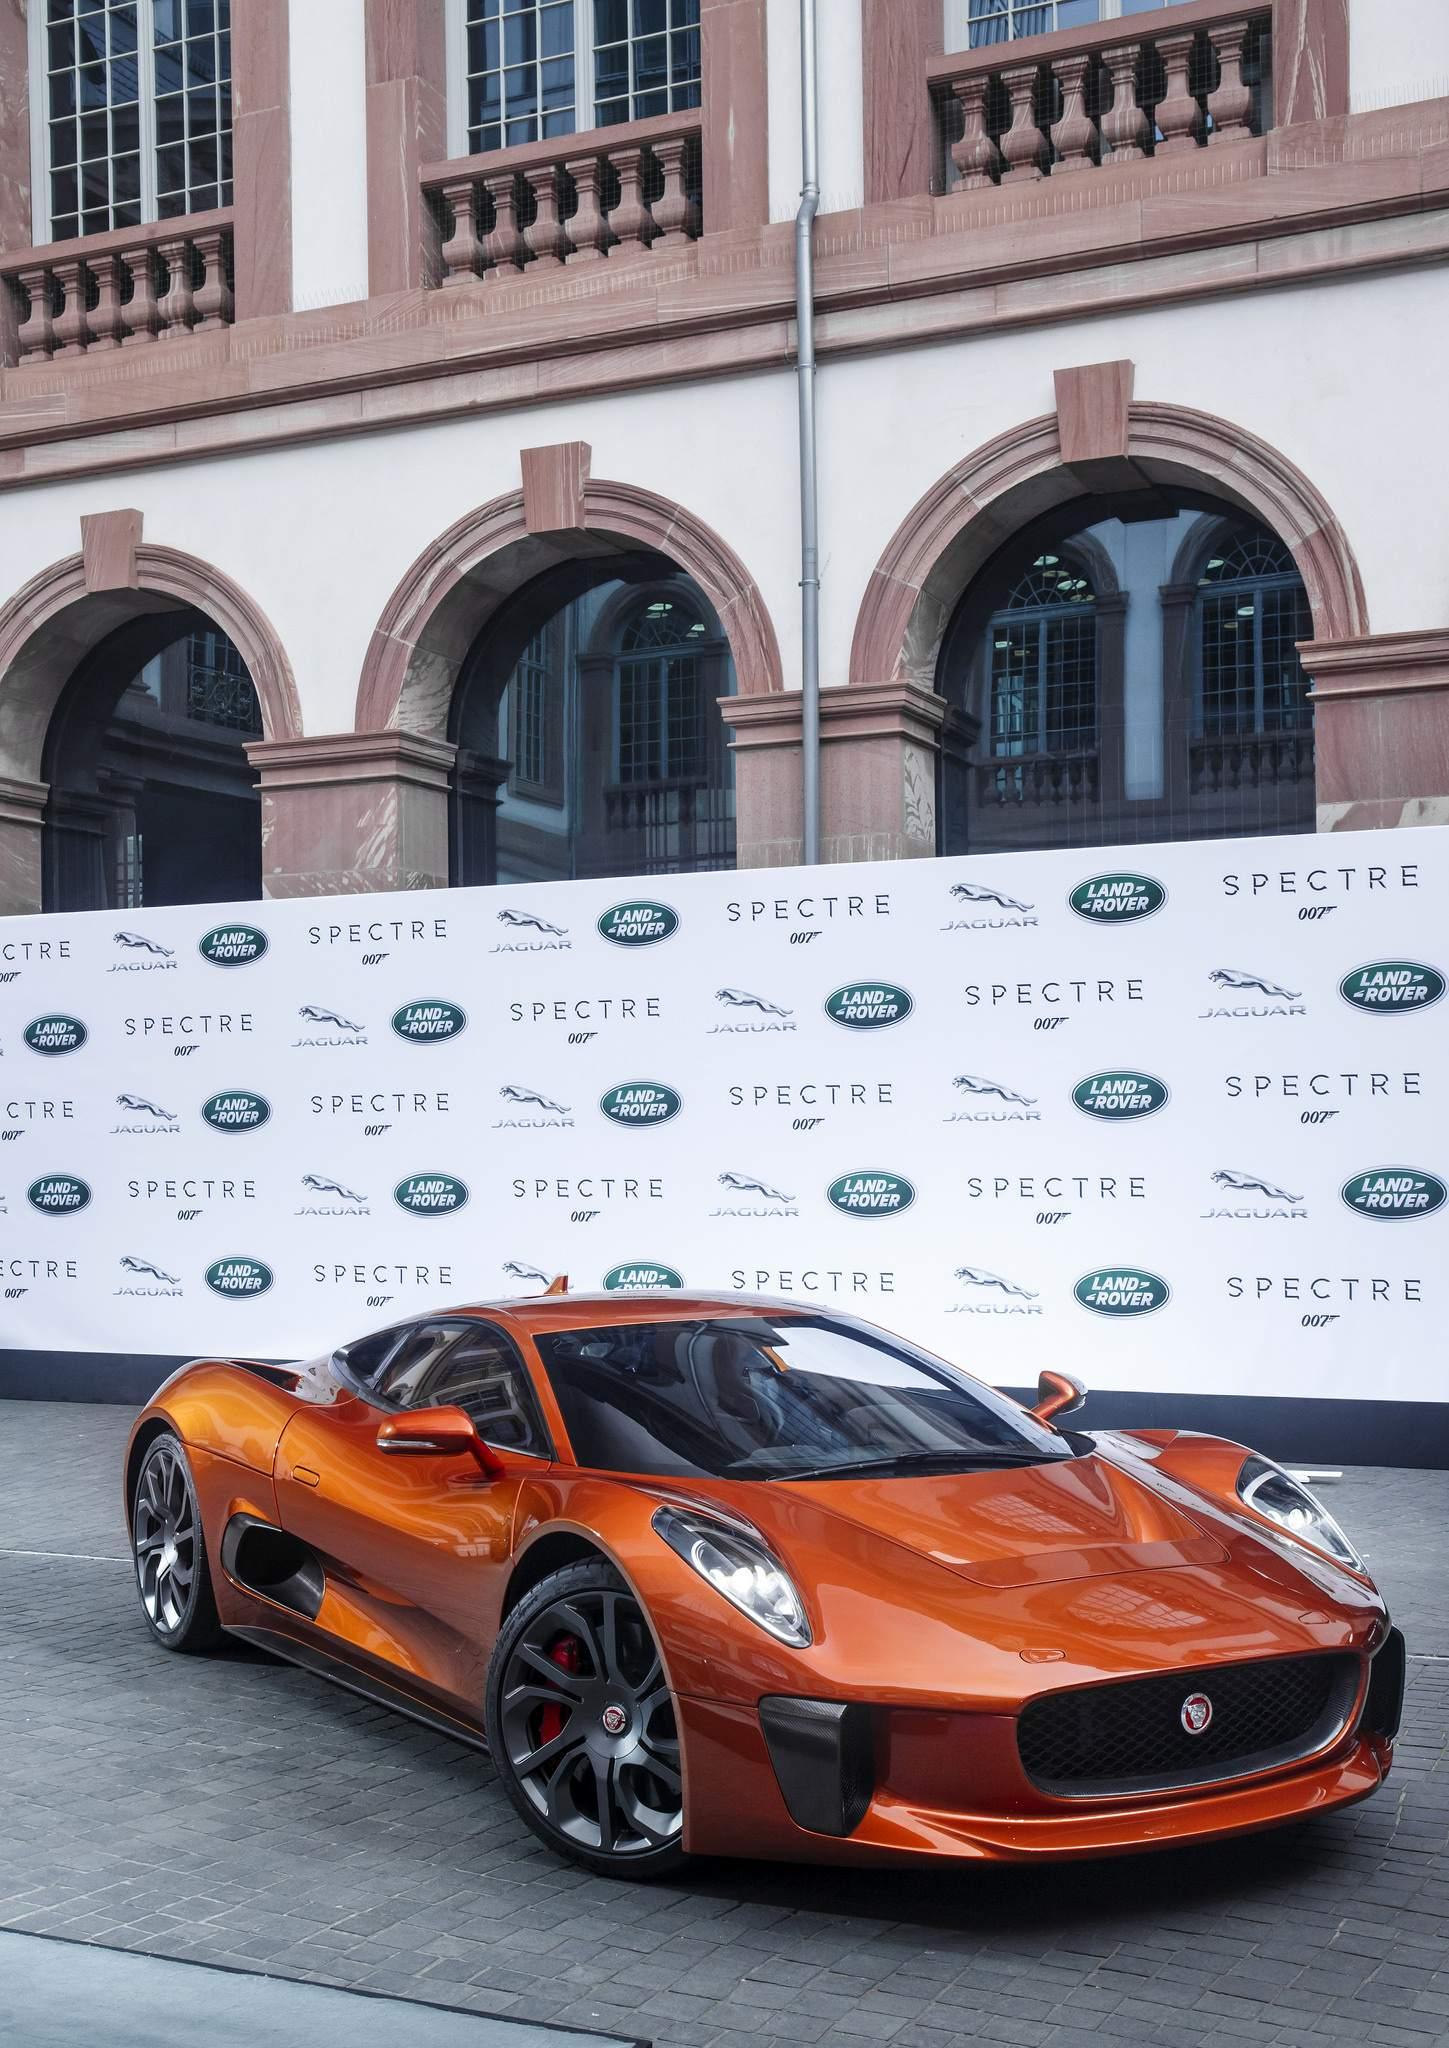 spectre car4 Jaguar Land Rover Latest Bond Cars